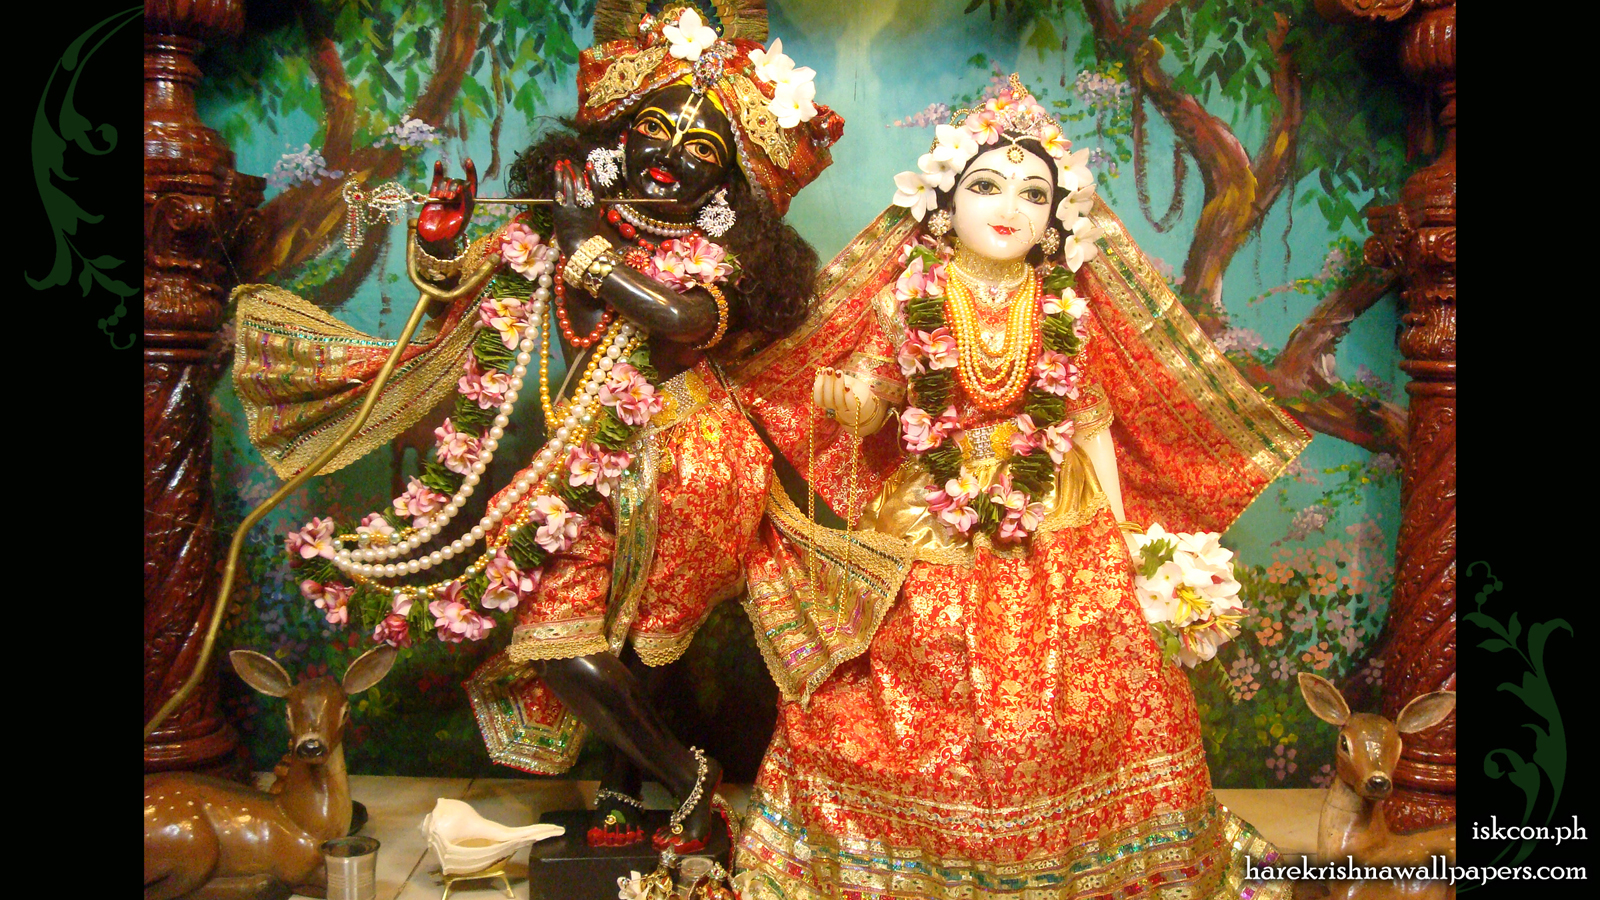 Sri Sri Radha Madhava Wallpaper (012) Size 1600x900 Download